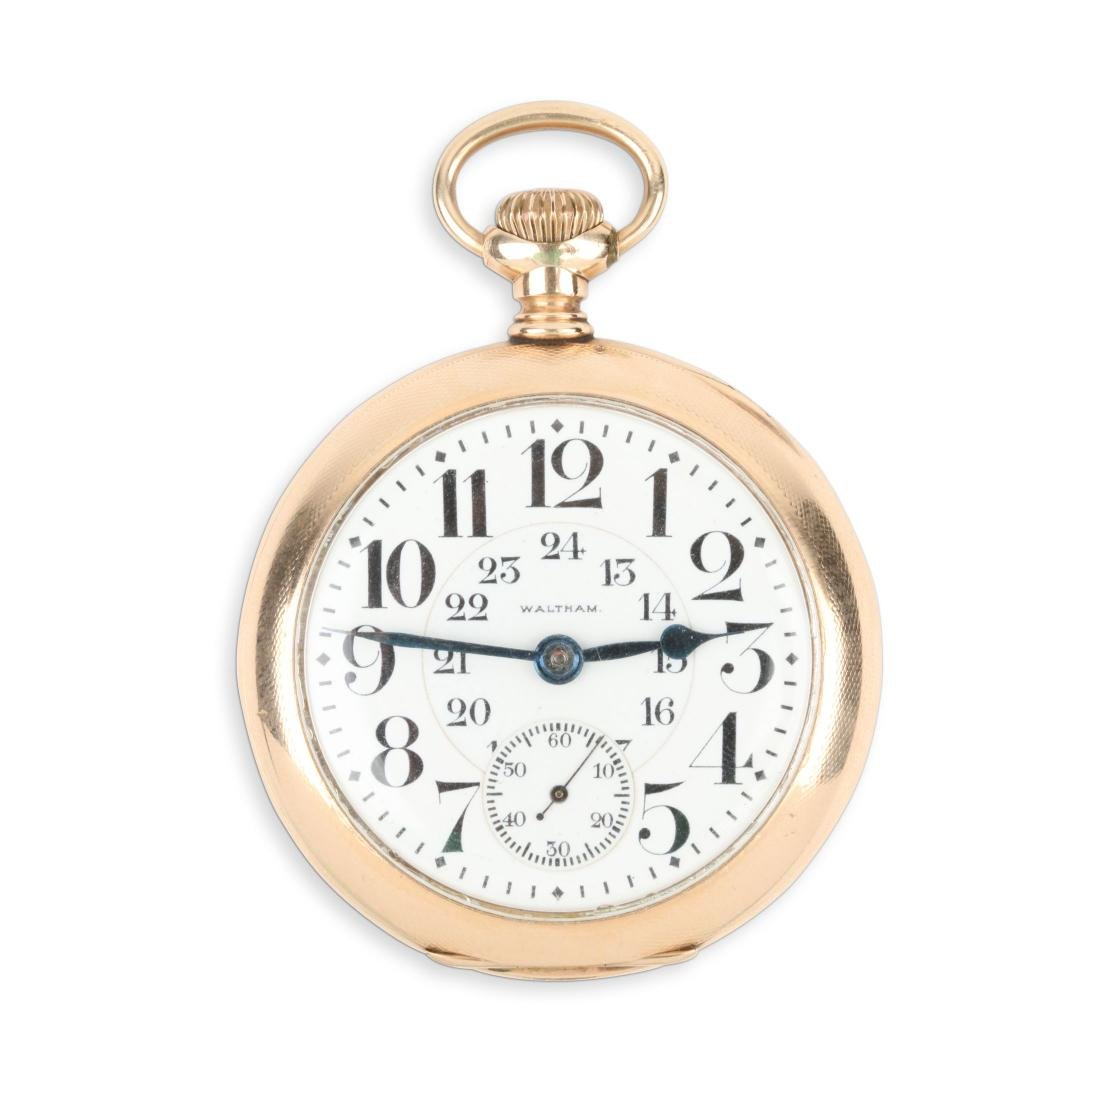 Waltham, Canadian Pacific Railway Pocket Watch